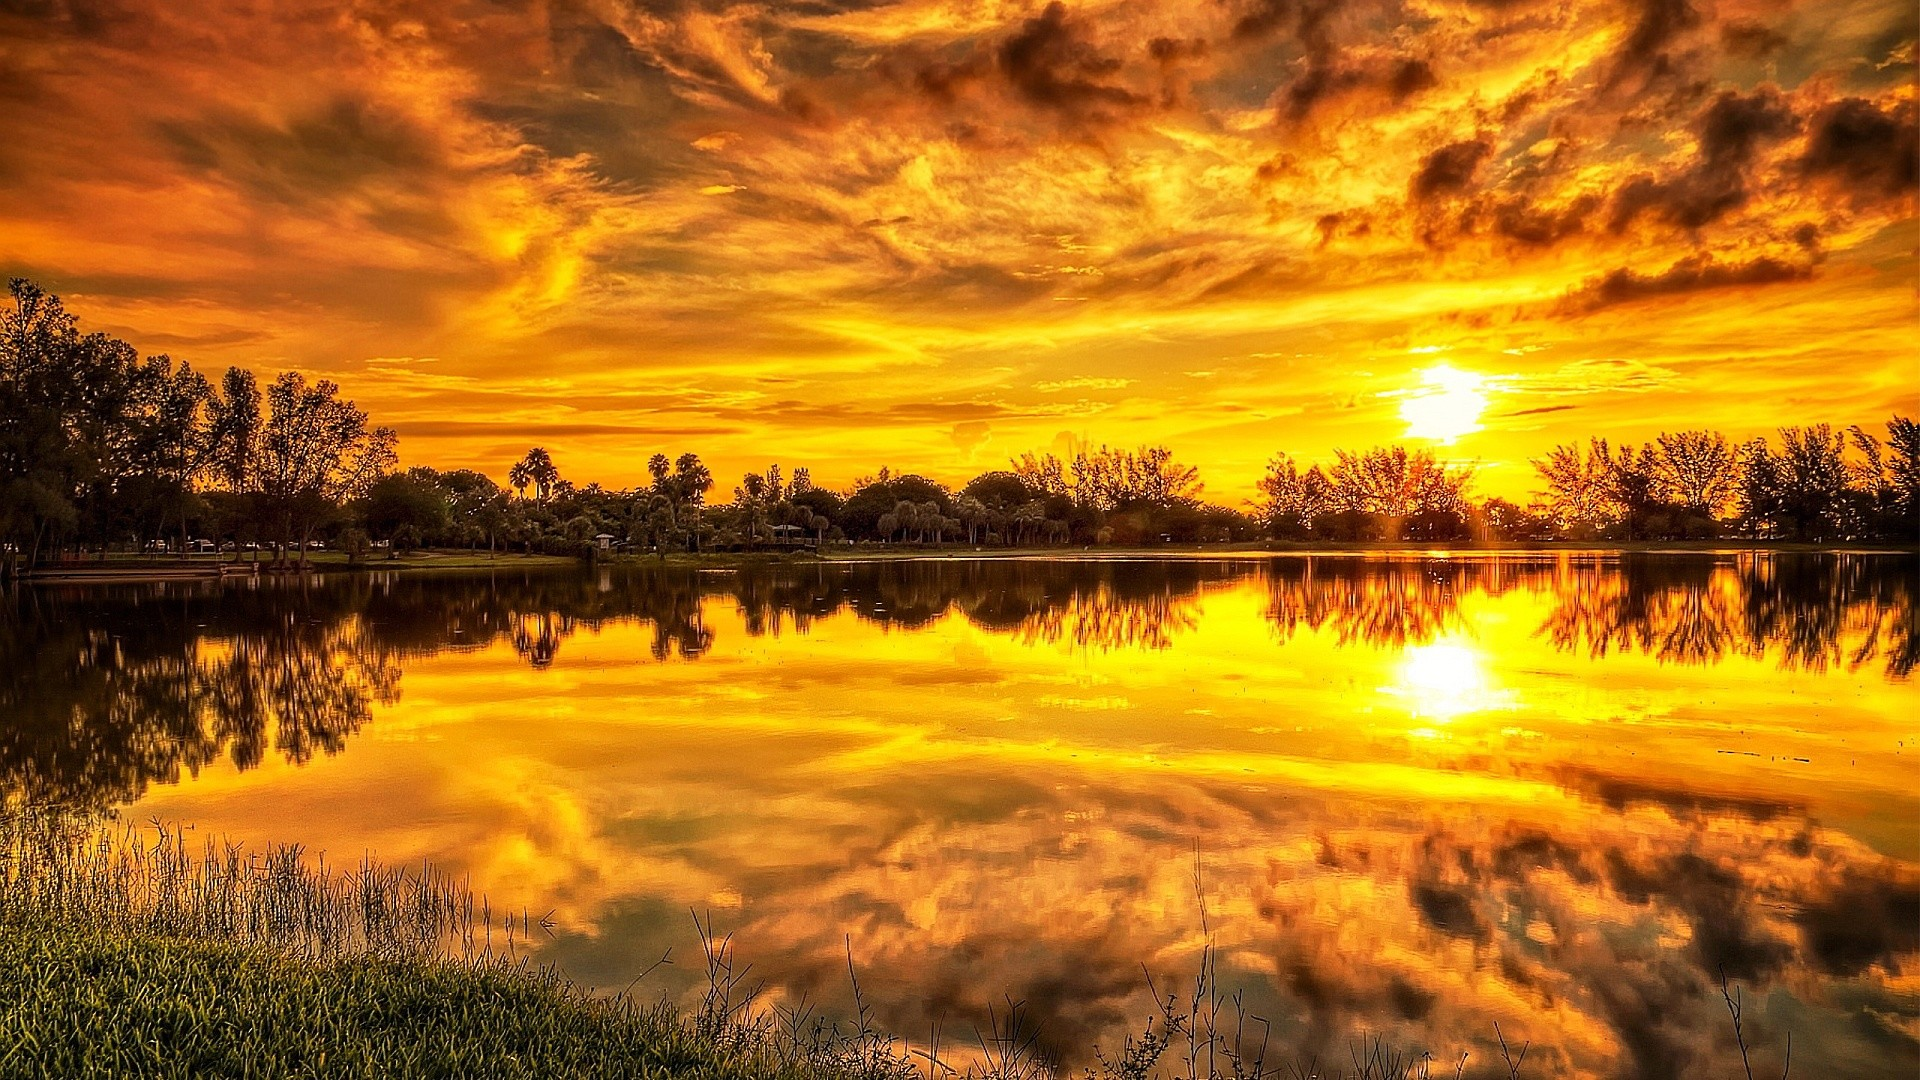 wallpaper 1366 x 786 hd,sky,nature,natural landscape,reflection,sunset